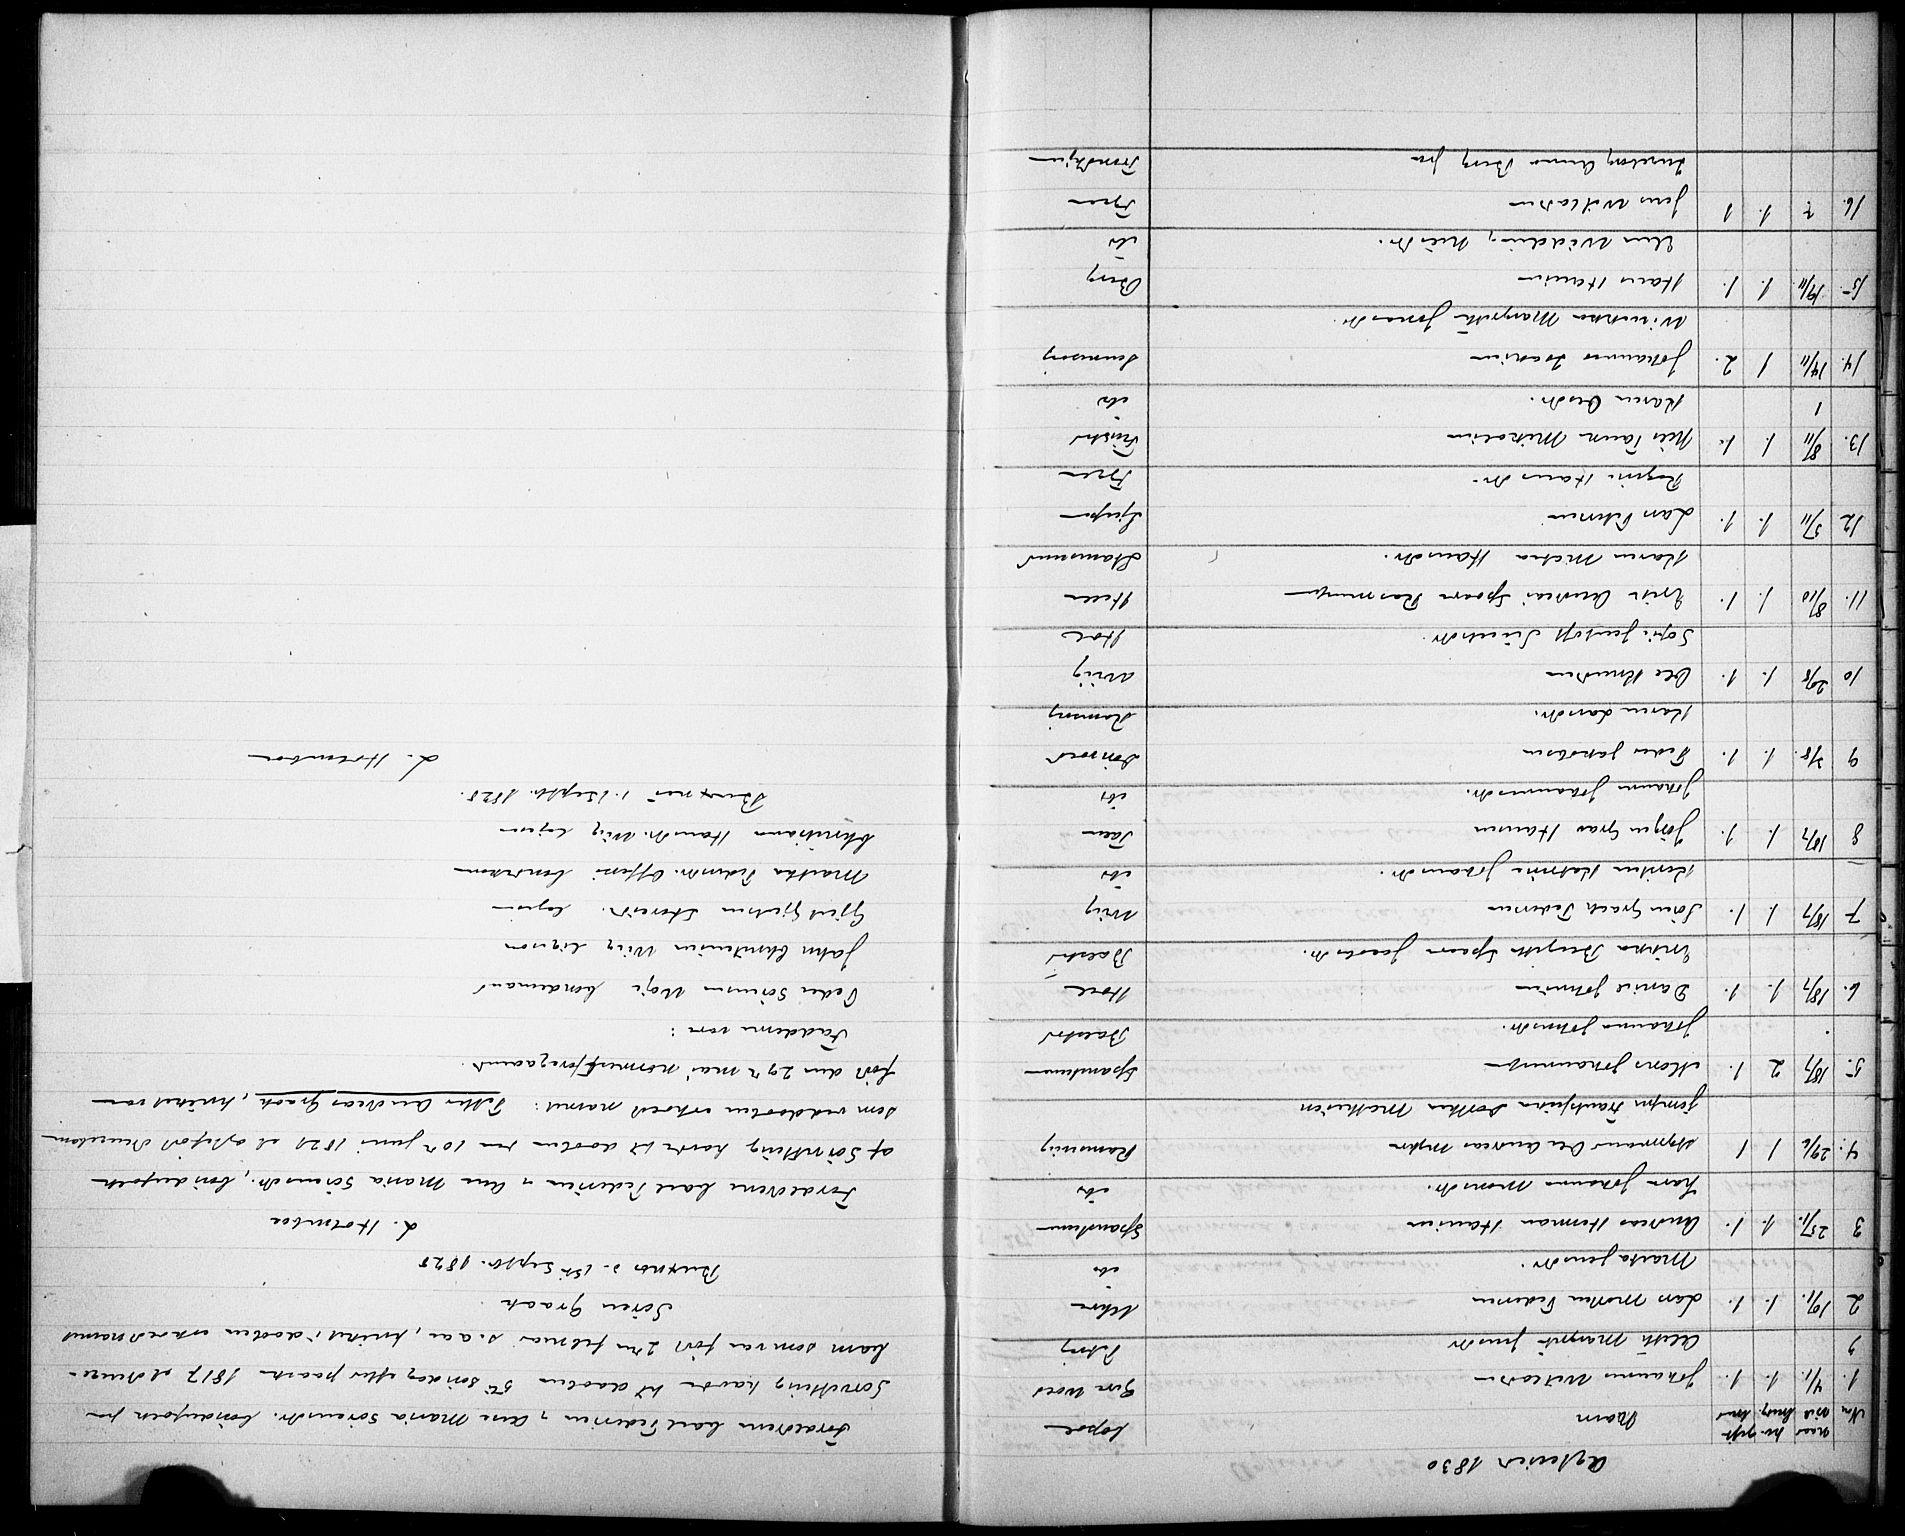 SAT, Ministerialprotokoller, klokkerbøker og fødselsregistre - Nordland, 881/L1150: Ministerialbok nr. 881A03, 1817-1840